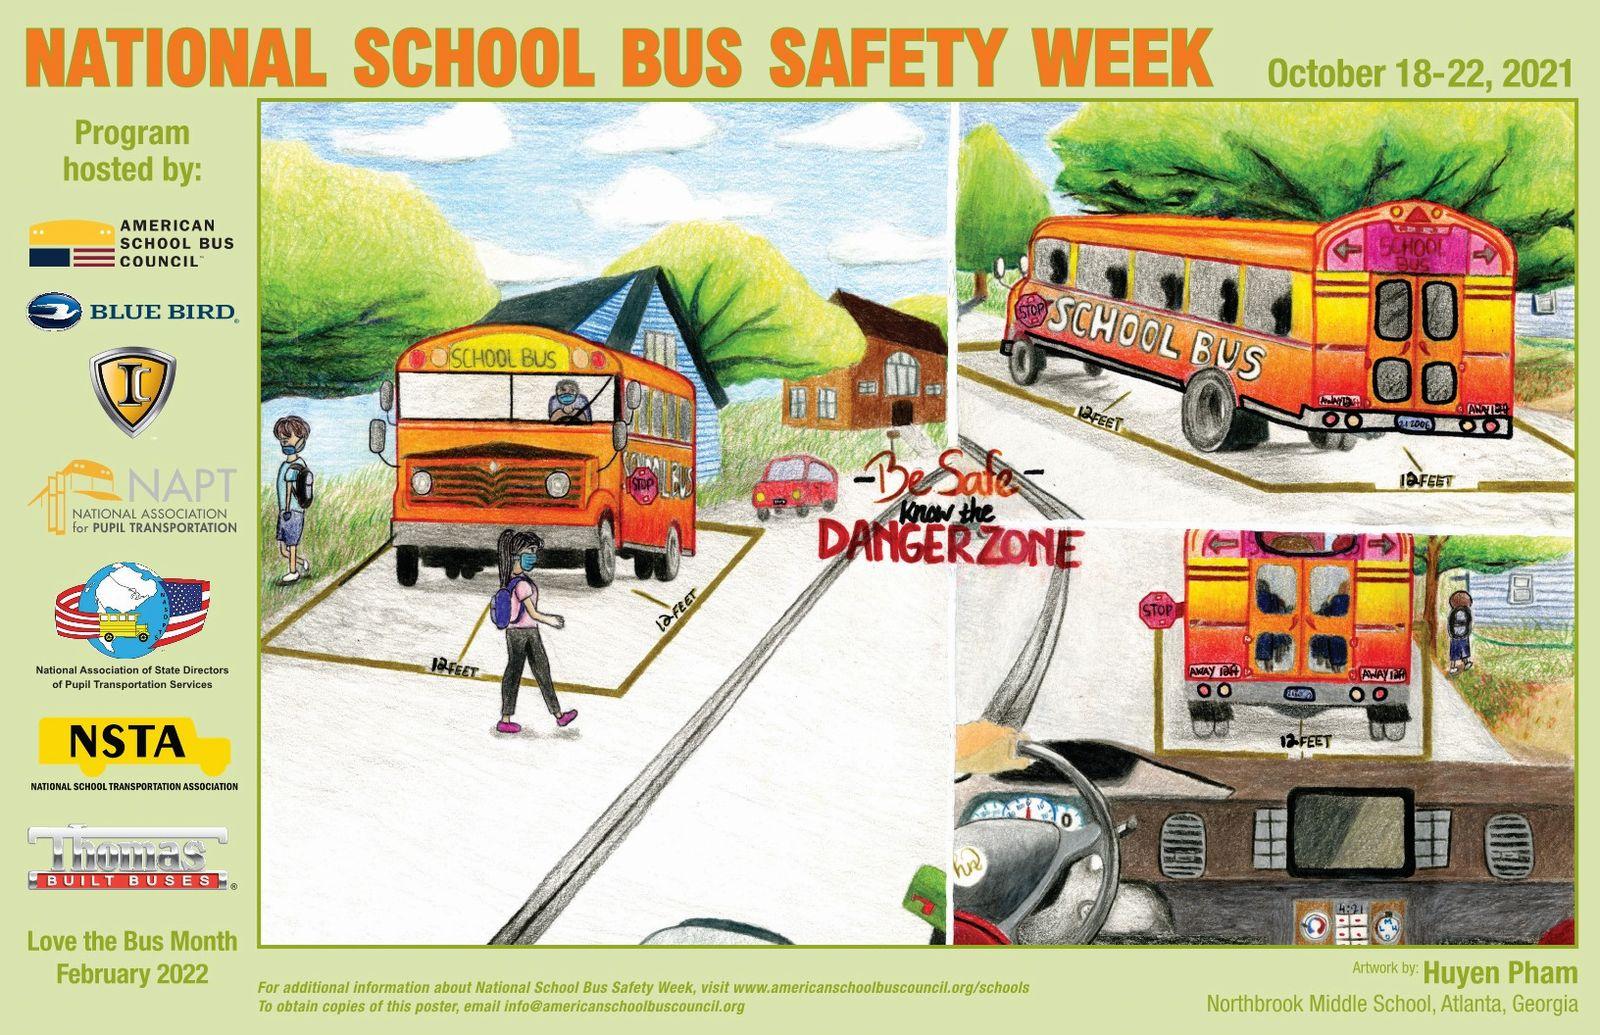 2021 National School Bus Safety Week: October 18-22, 2021.